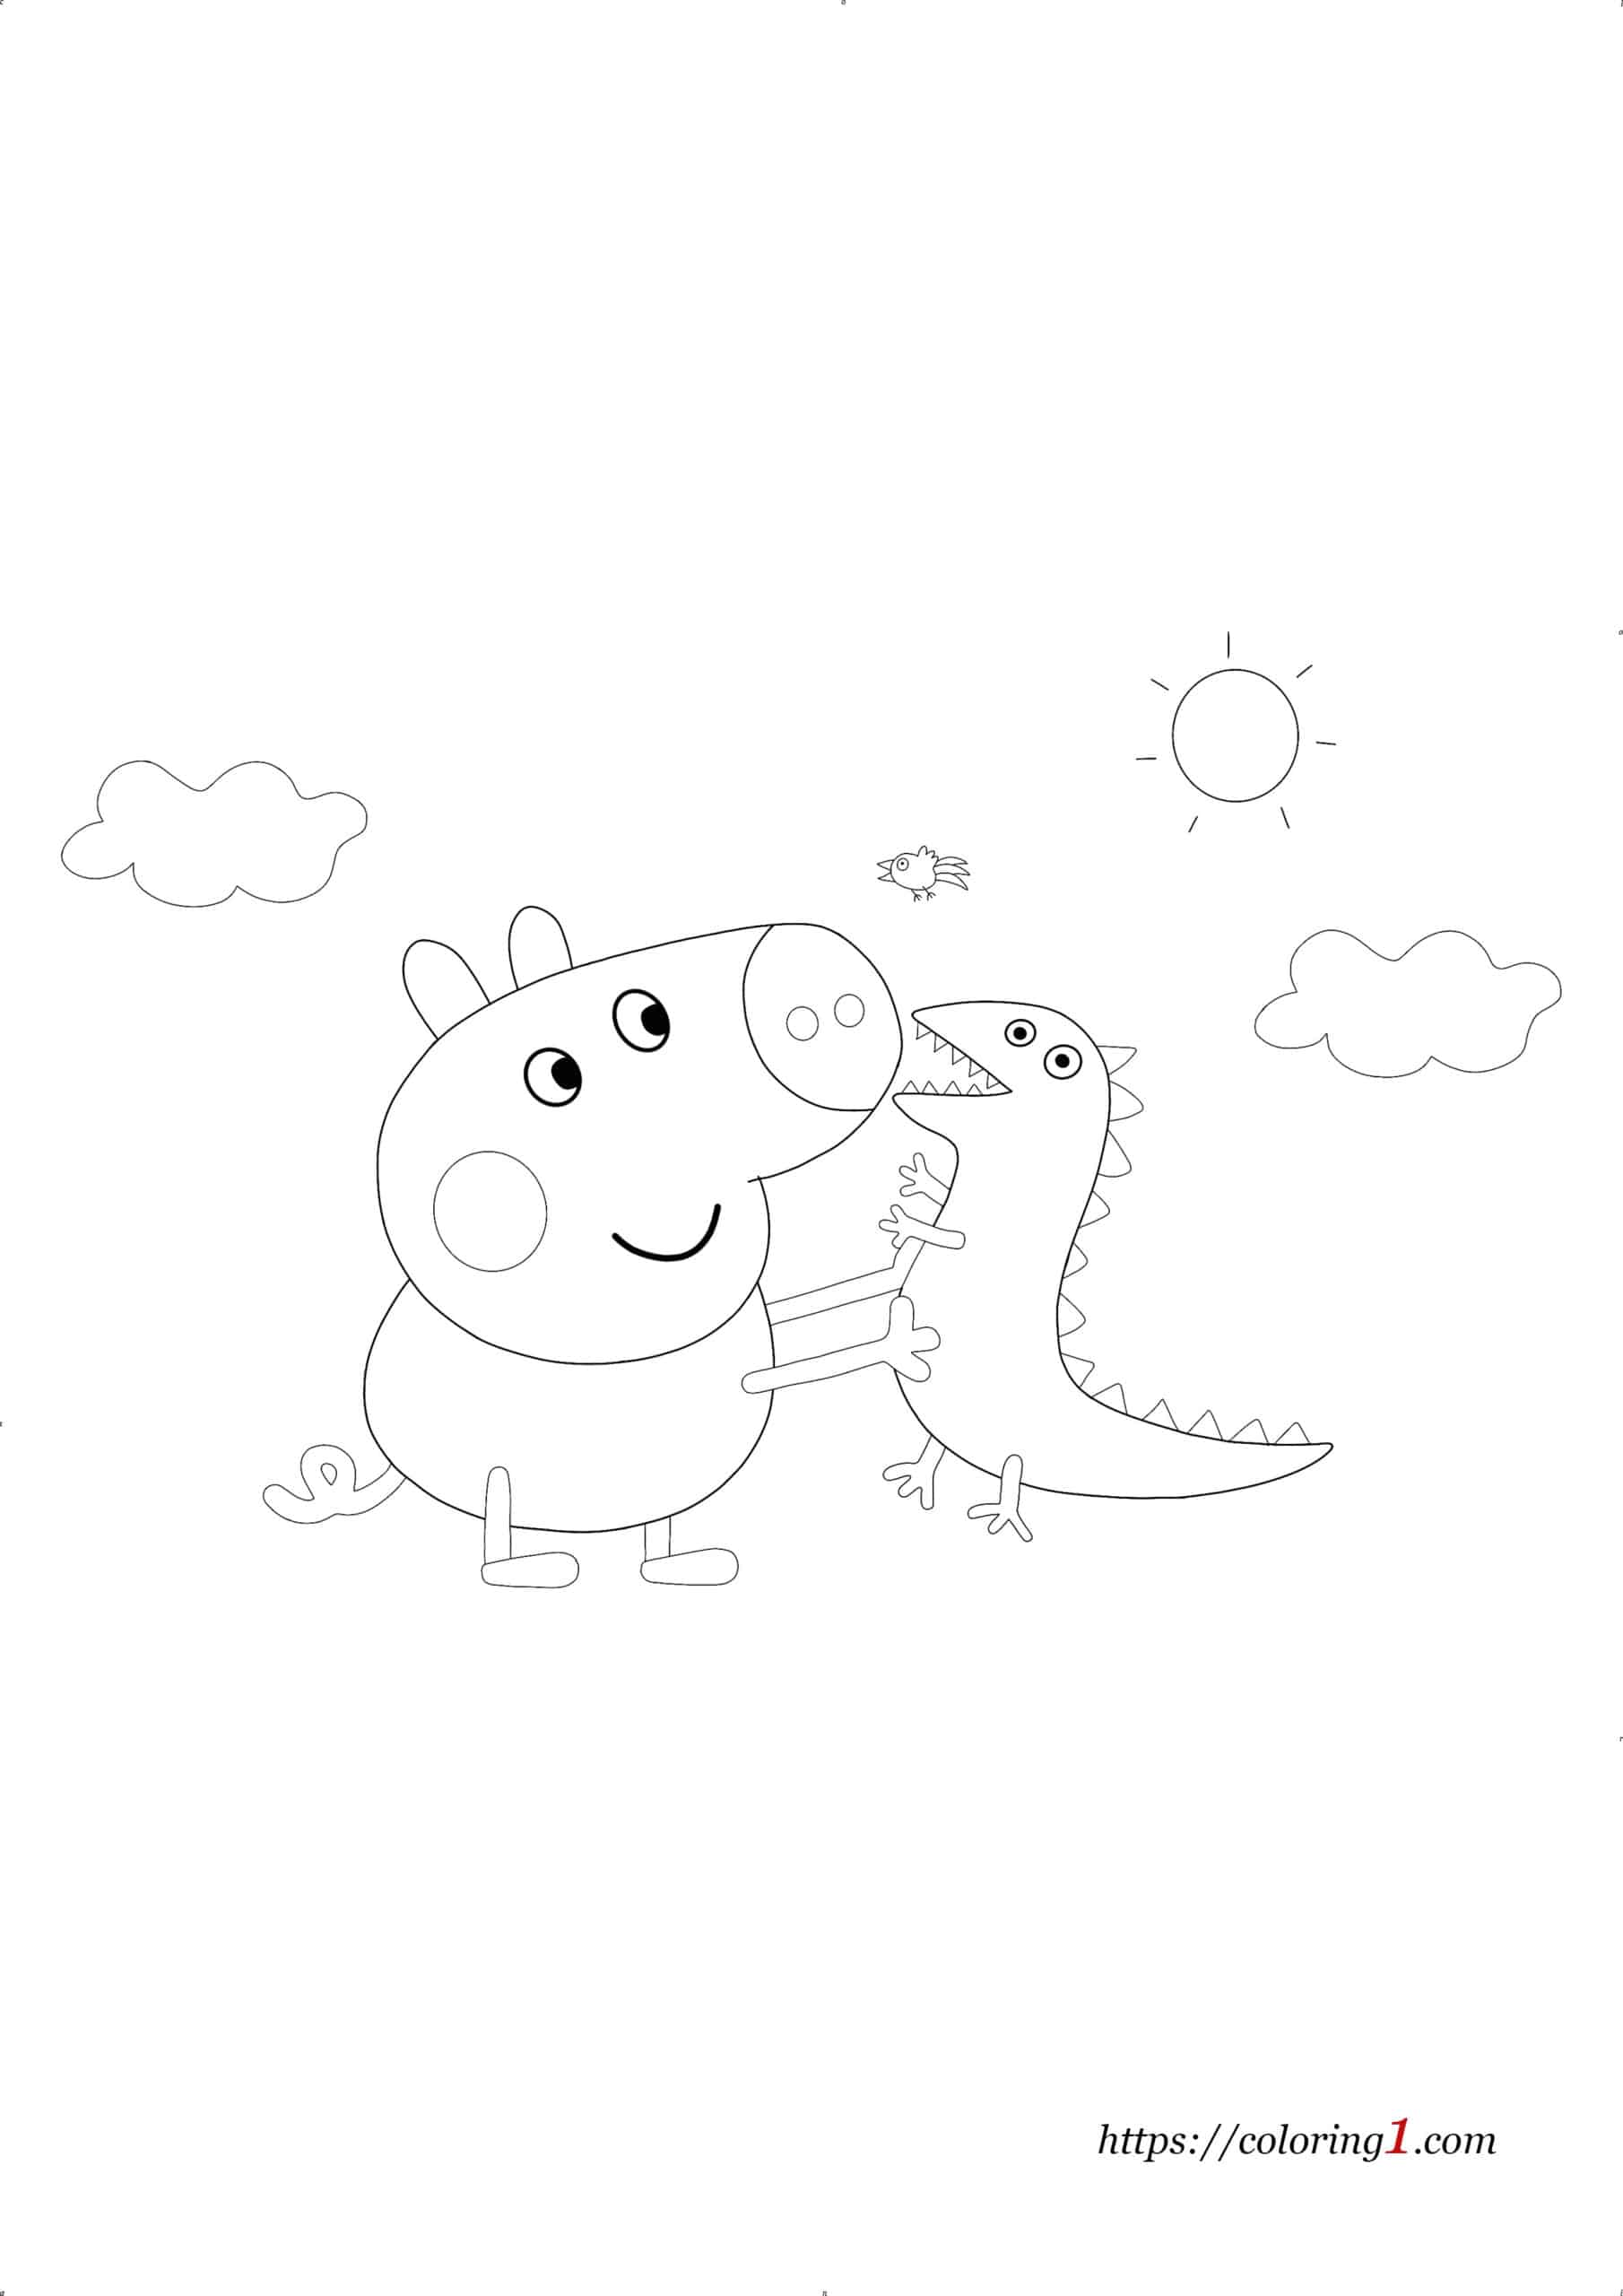 Coloriage Peppa Pig George avec Dinosaure